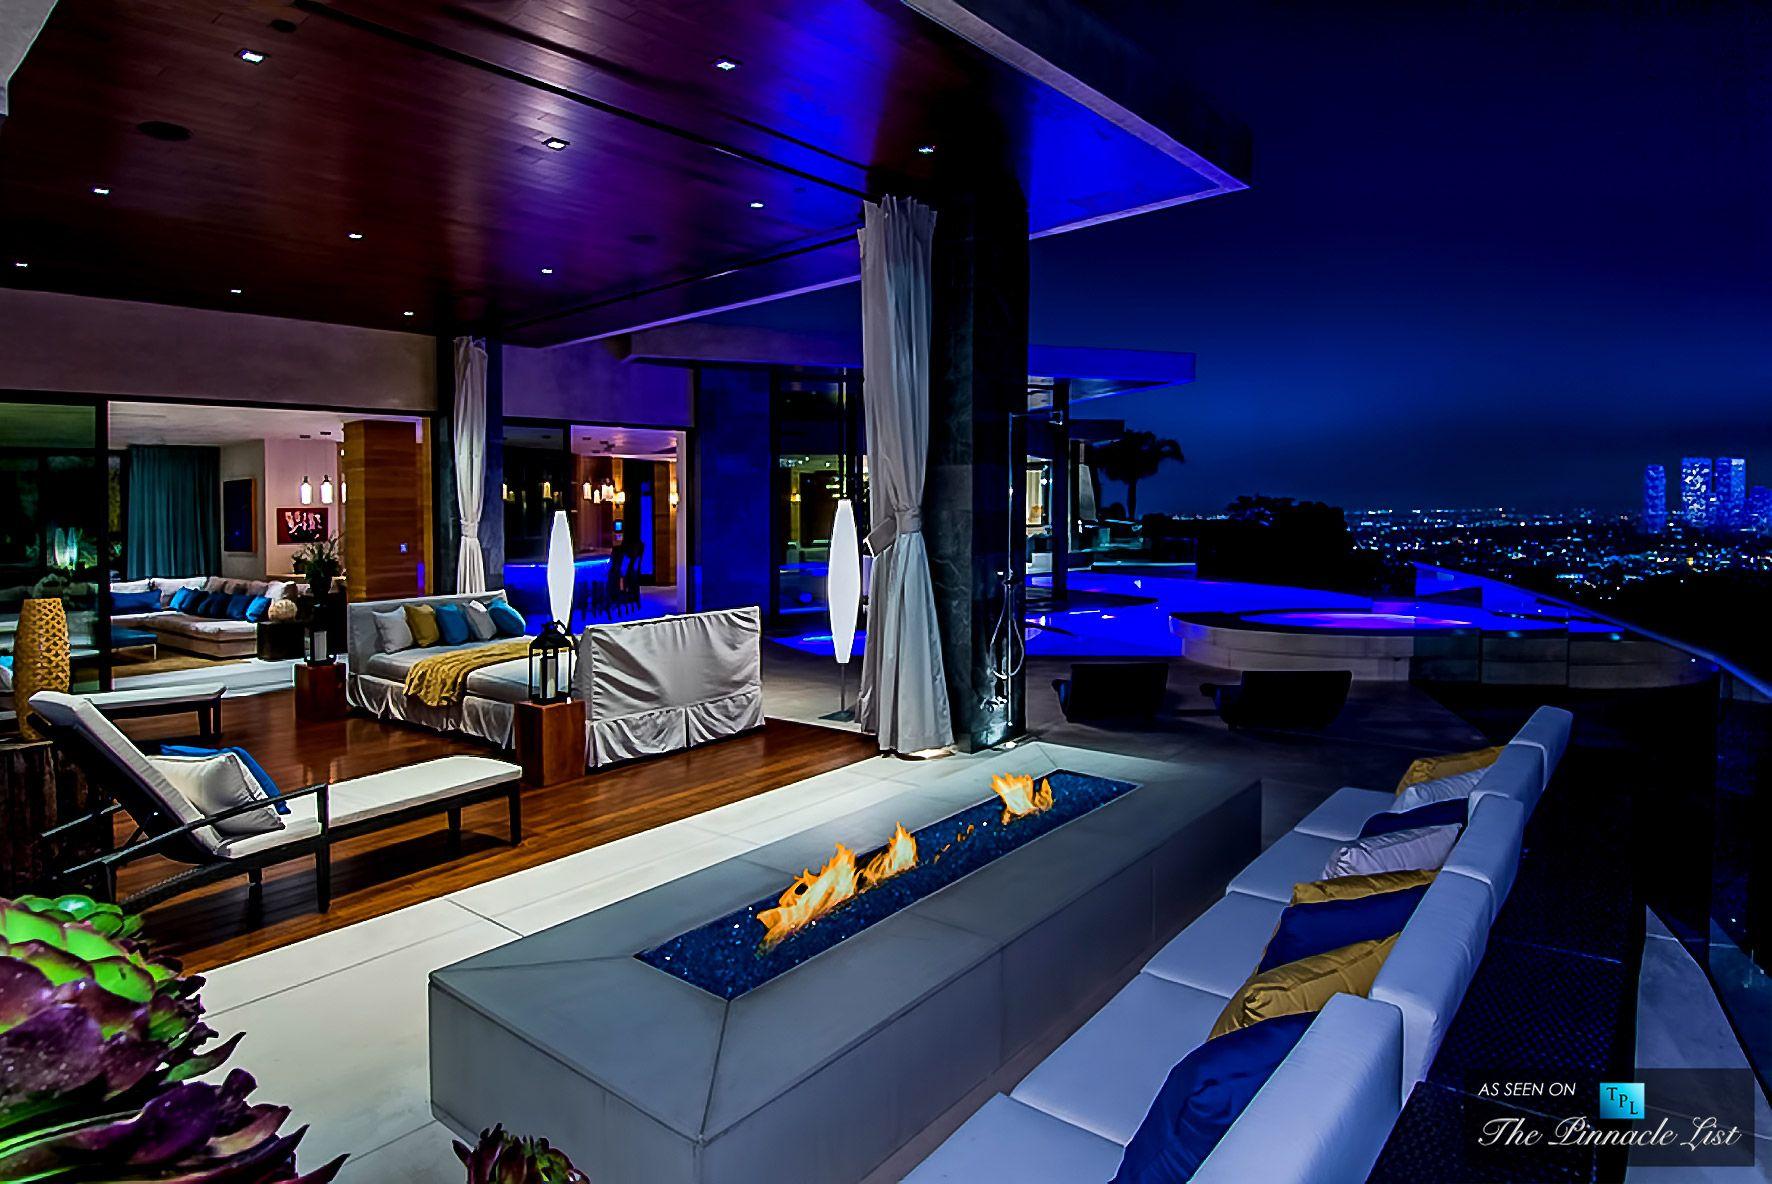 1525 blue jay way luxury bird street property in los angeles california dreamhome patio losangeles